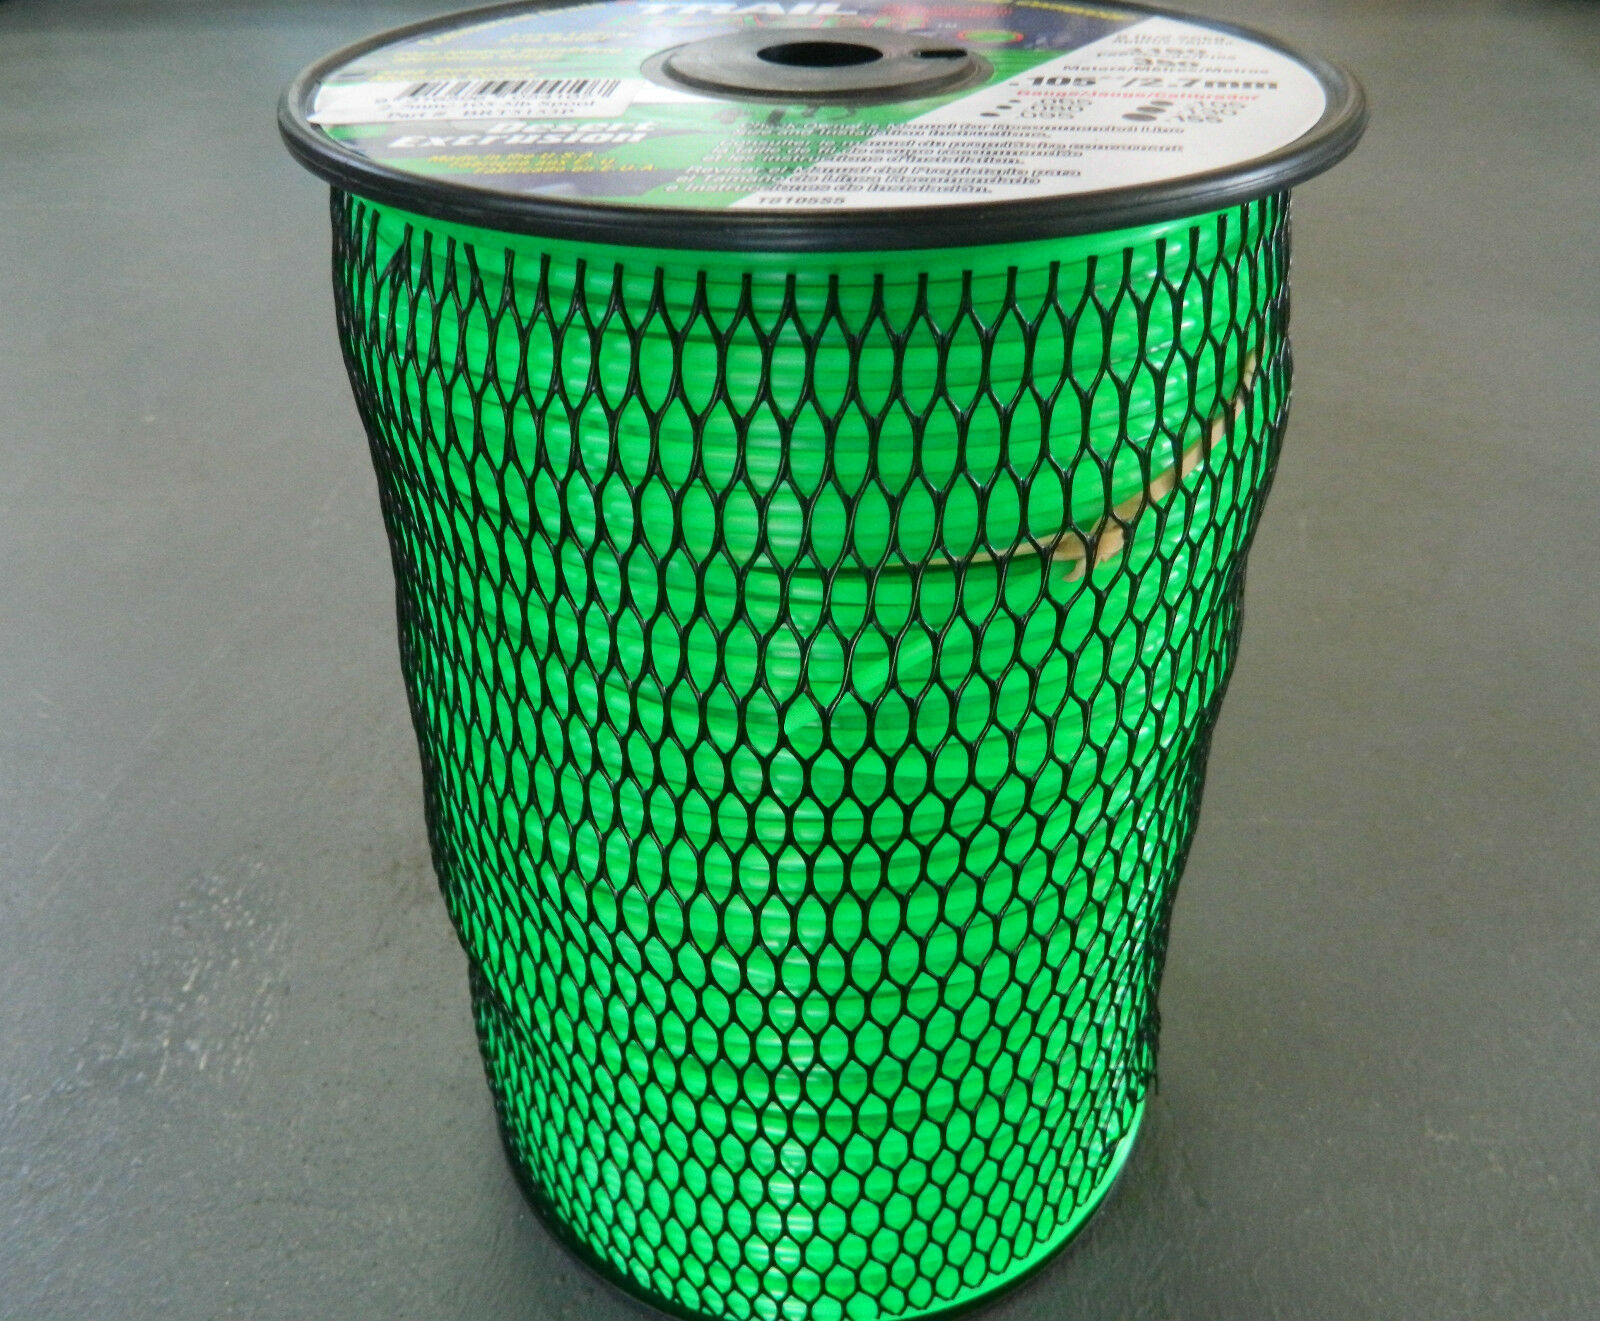 Trail Blazer Nylon Copolymer Trimmer Cord 55